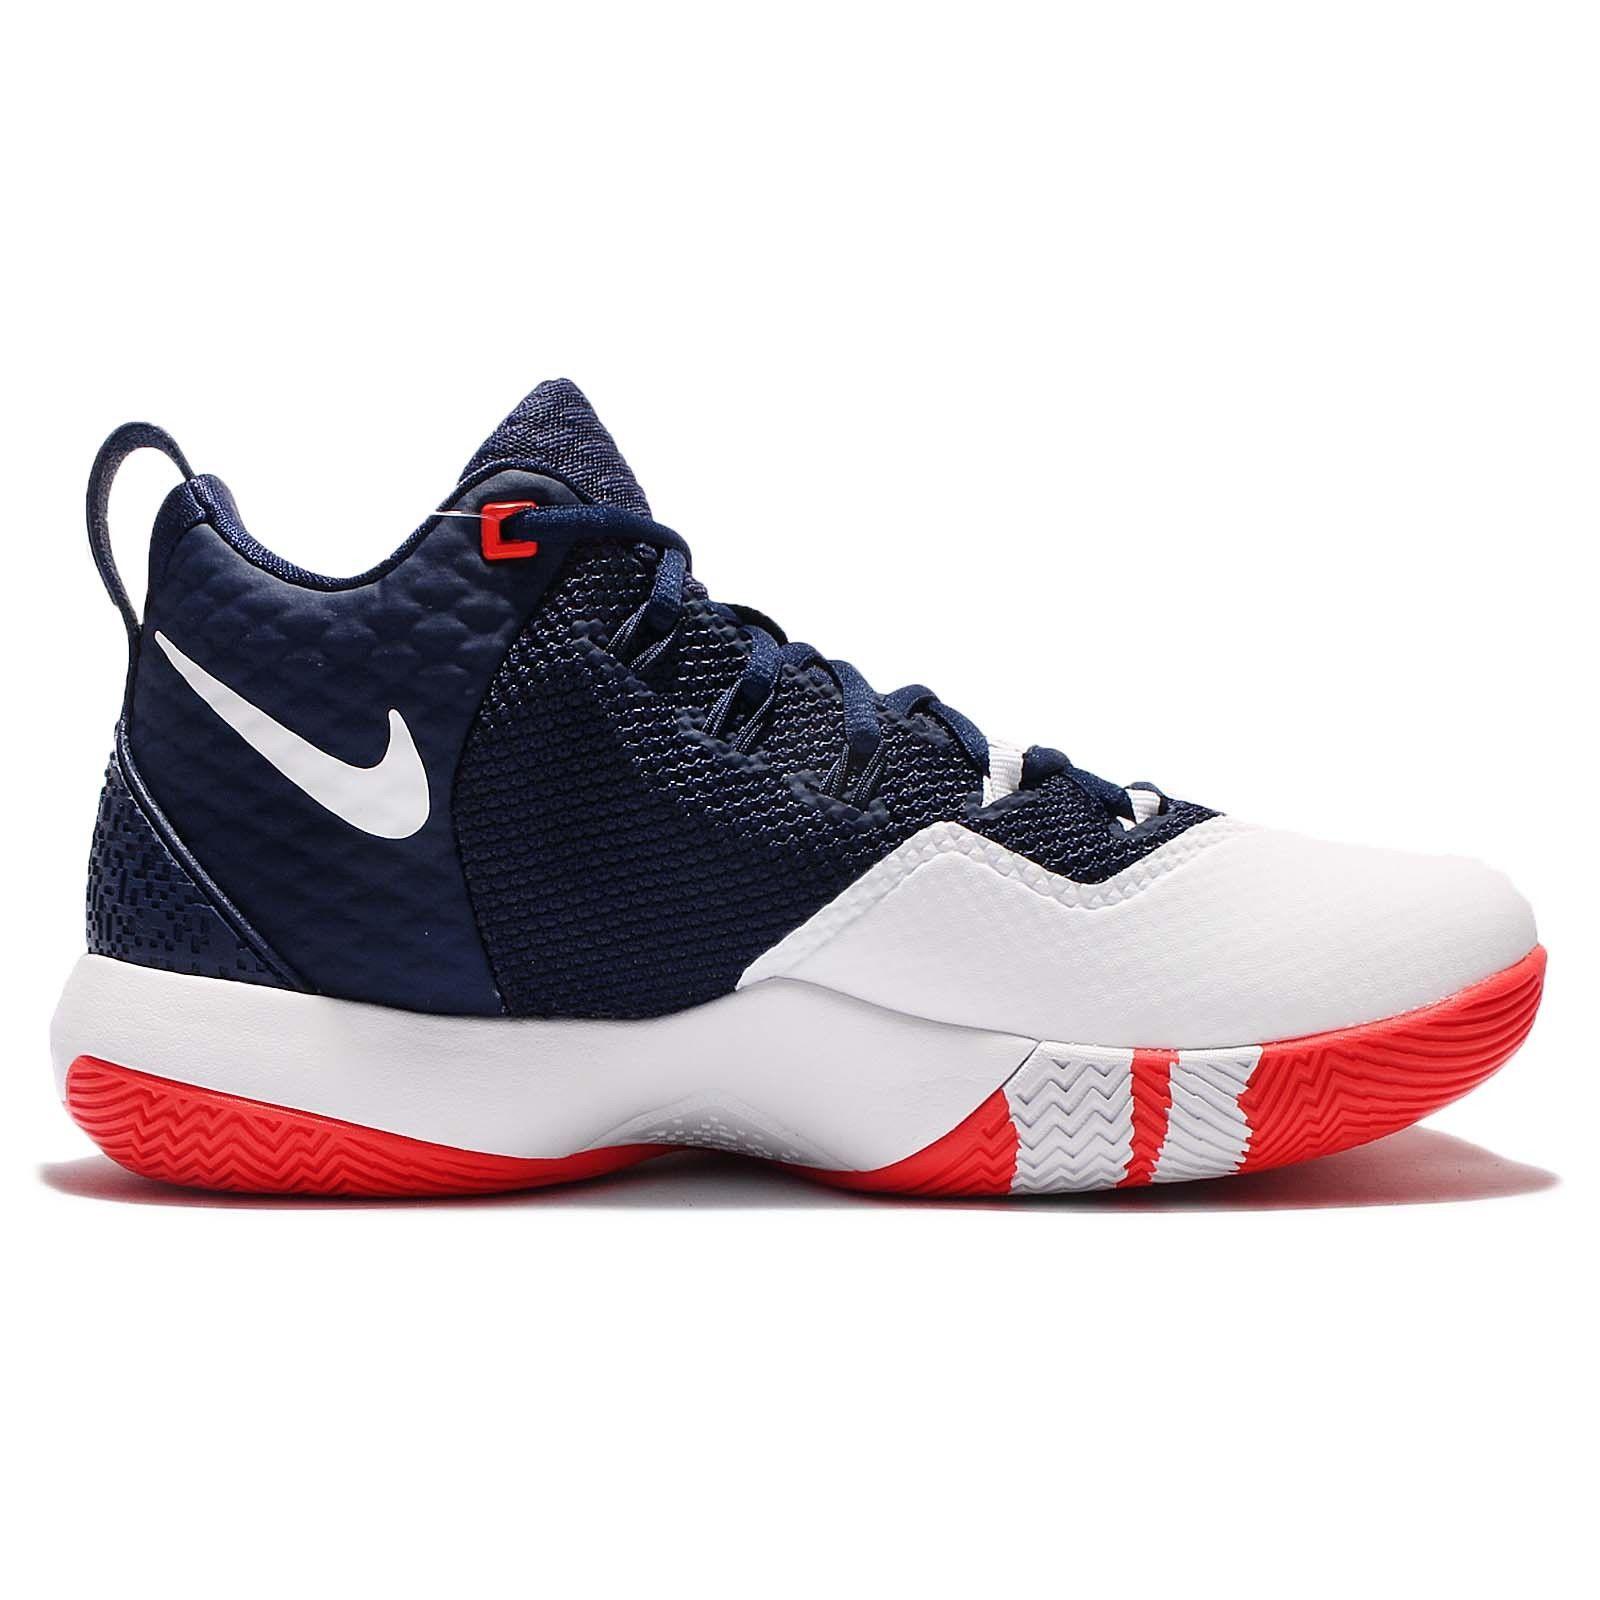 more photos 5619c 655a5 Nike Lebron Ambassador 9 - USA - medial - WearTesters